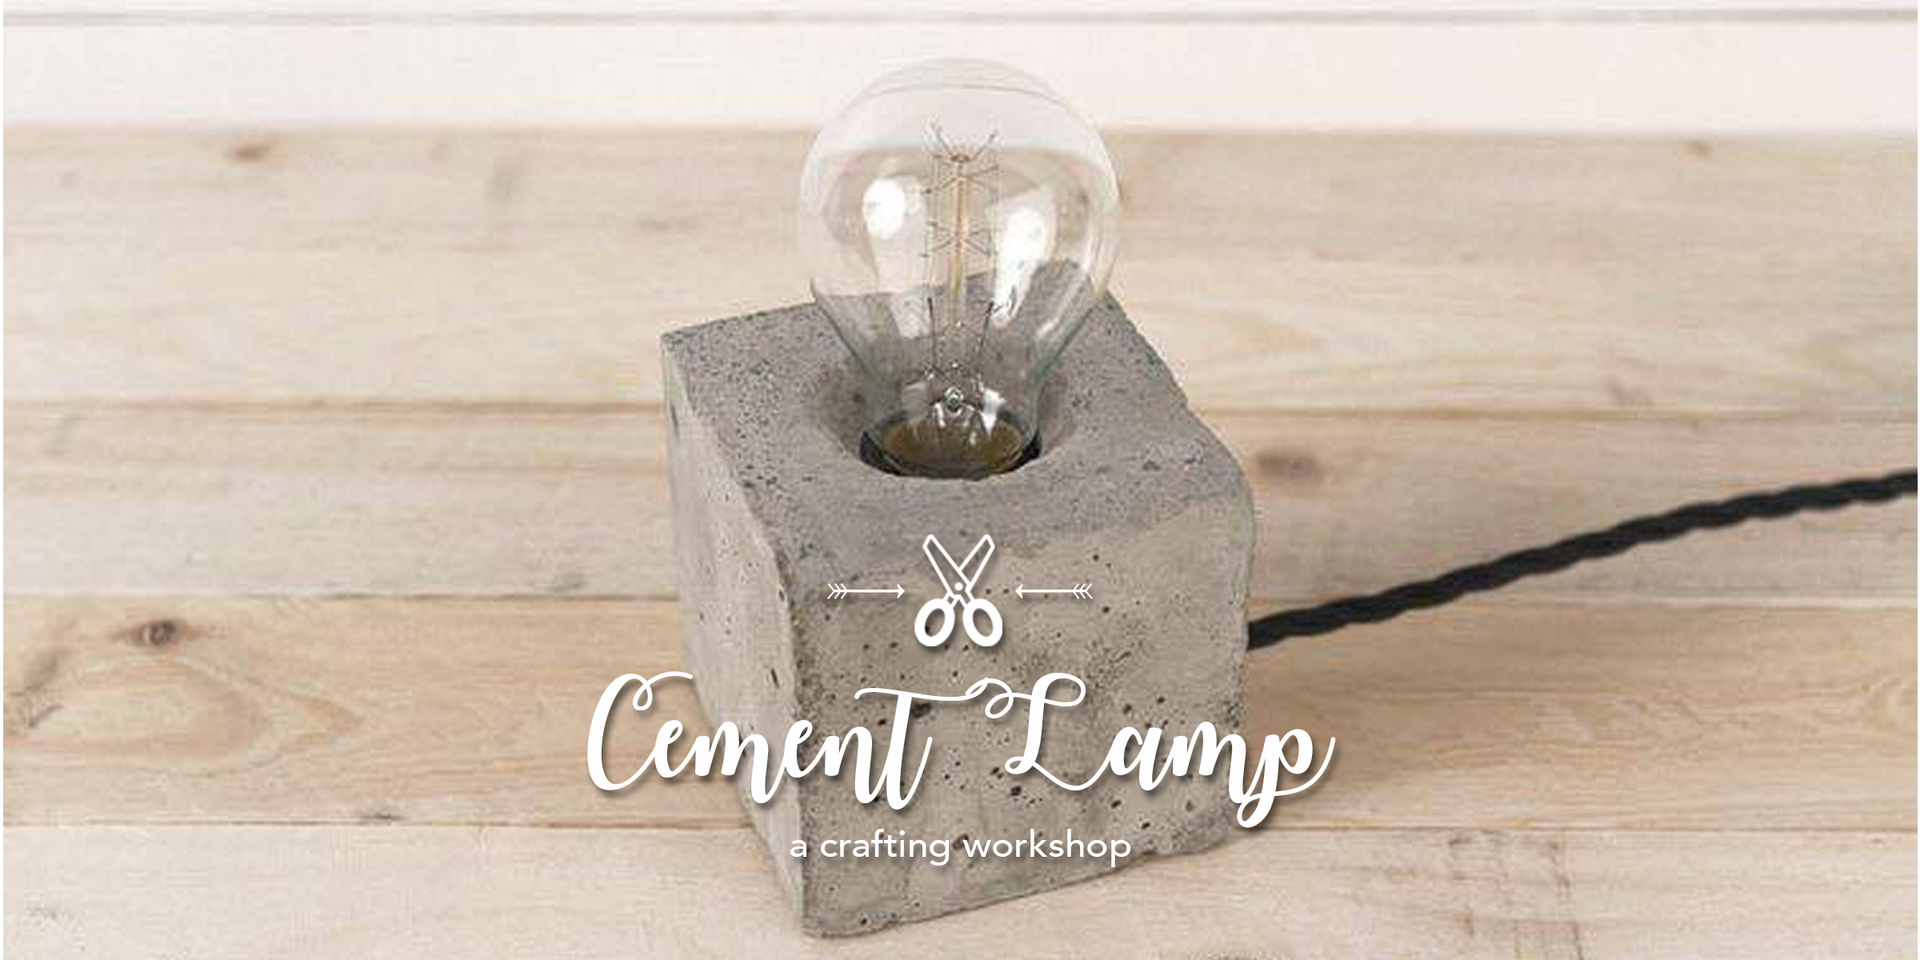 Cement Lamp